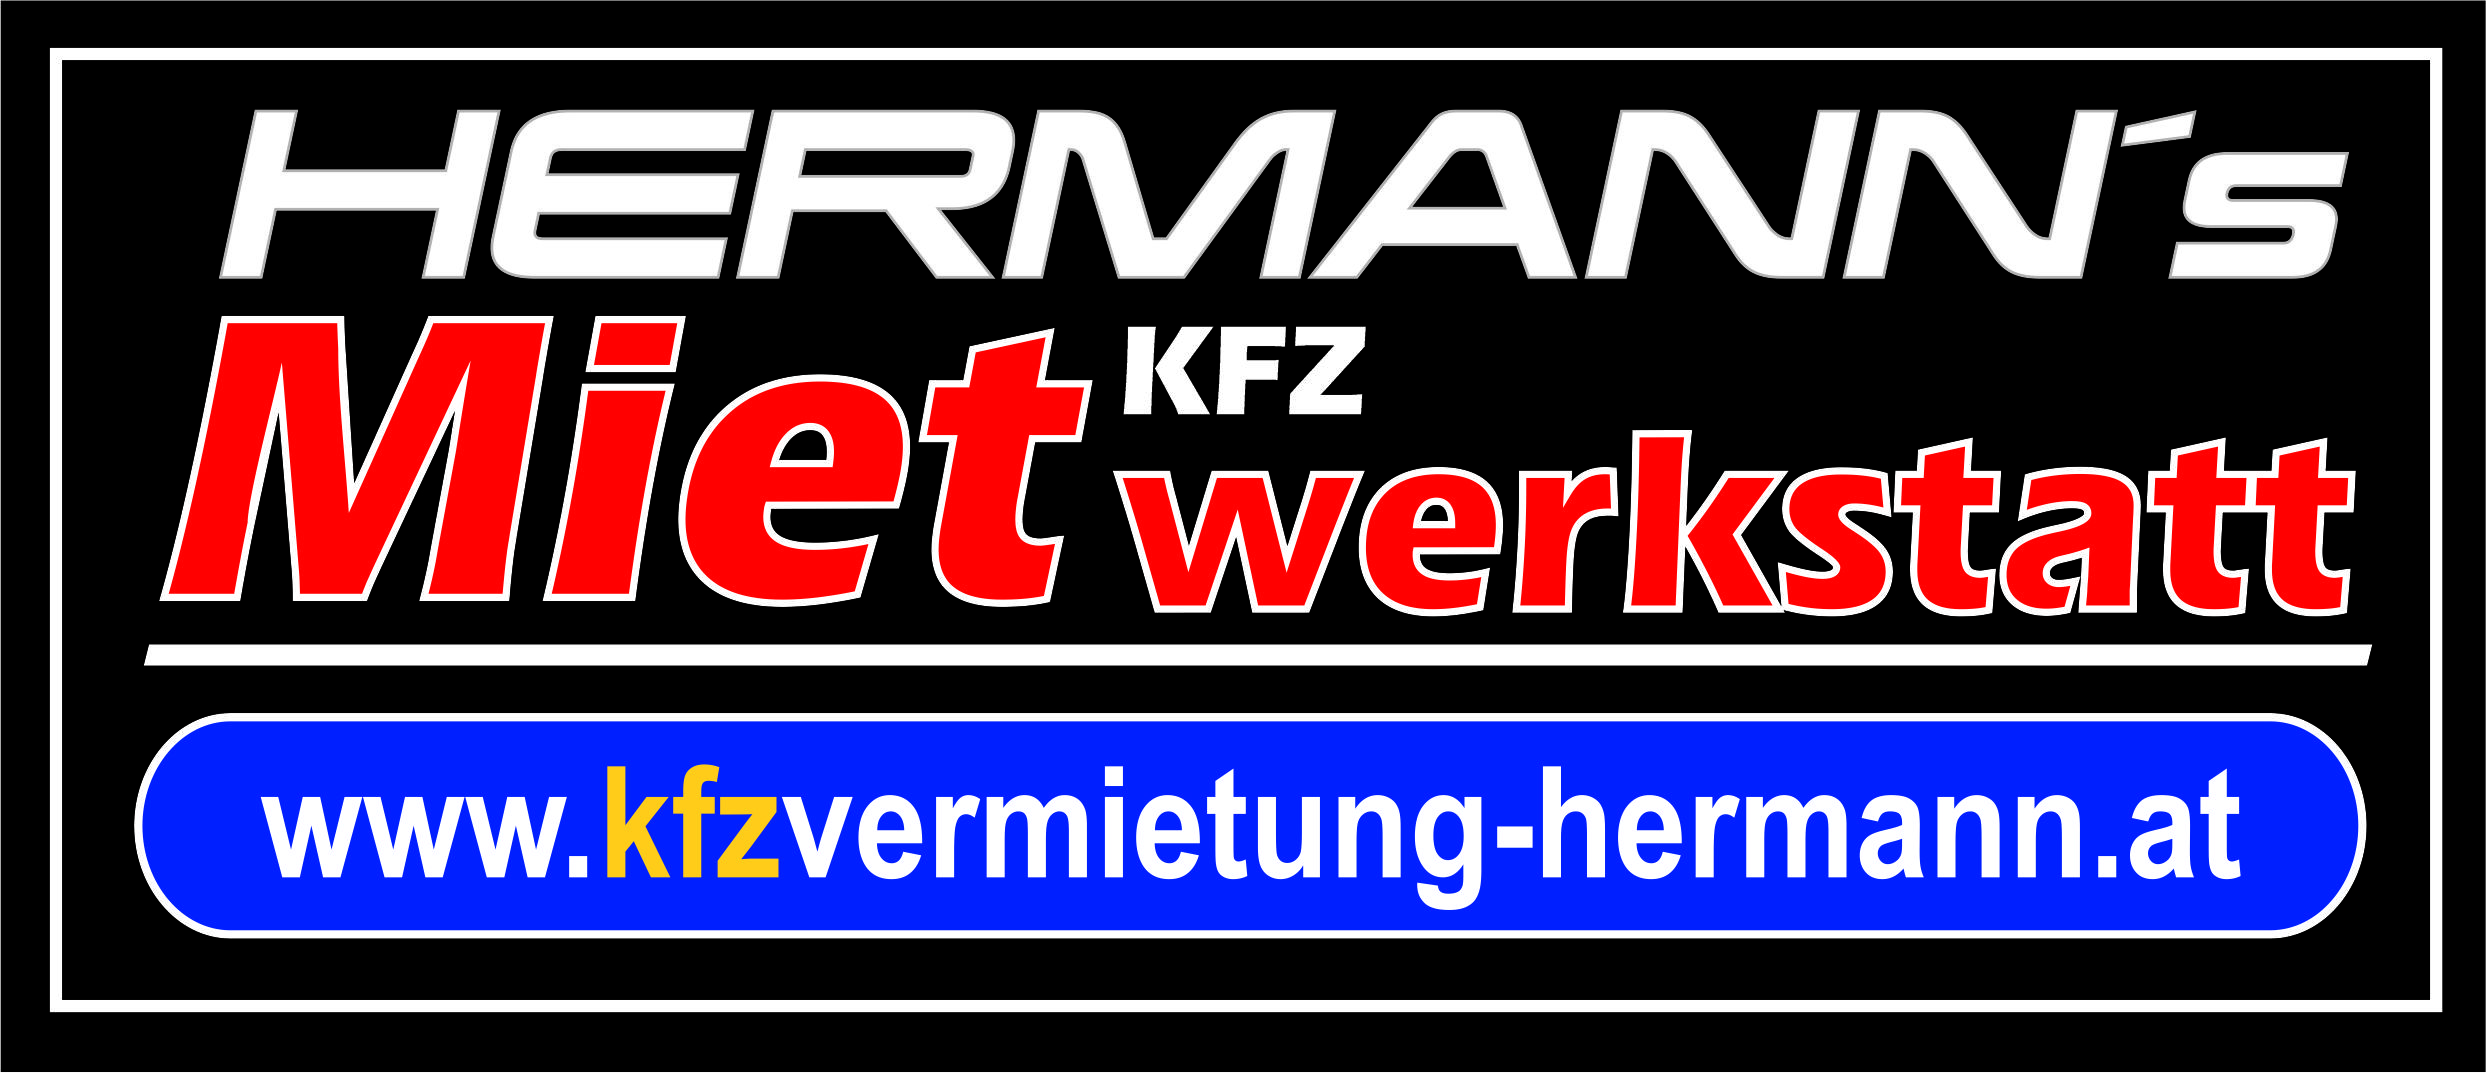 kfzvermietung-hermannat--article-1179-0.jpeg